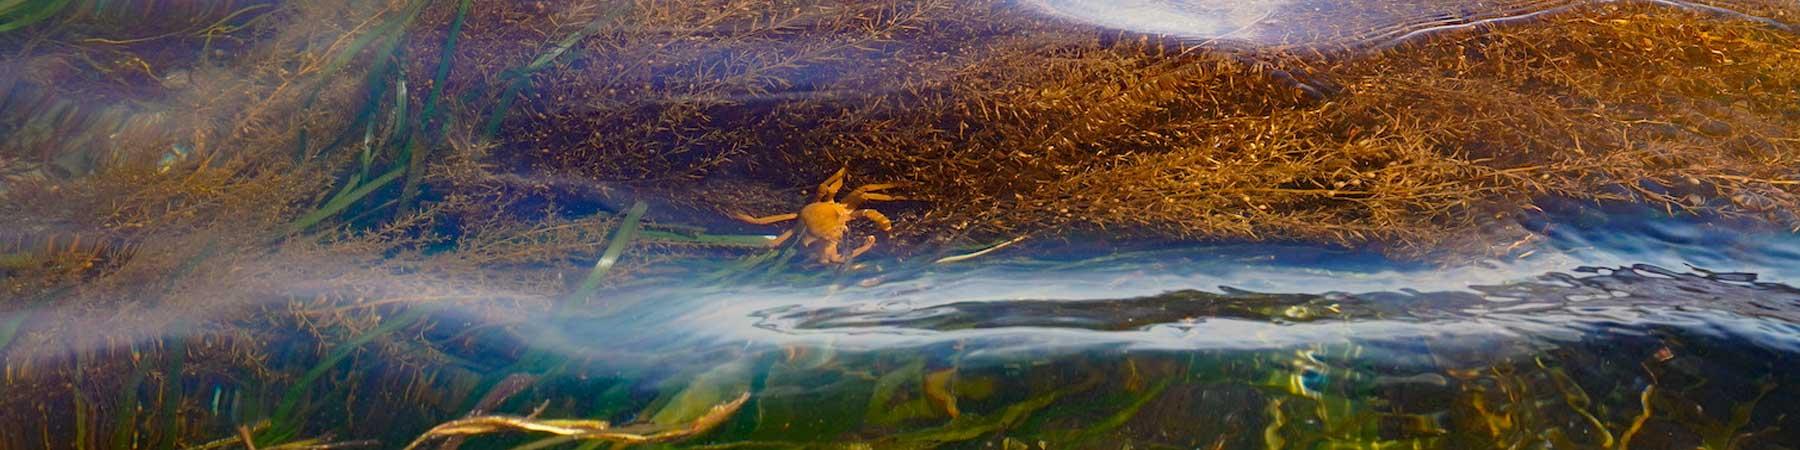 Coastal Wetlands Conservation Priority